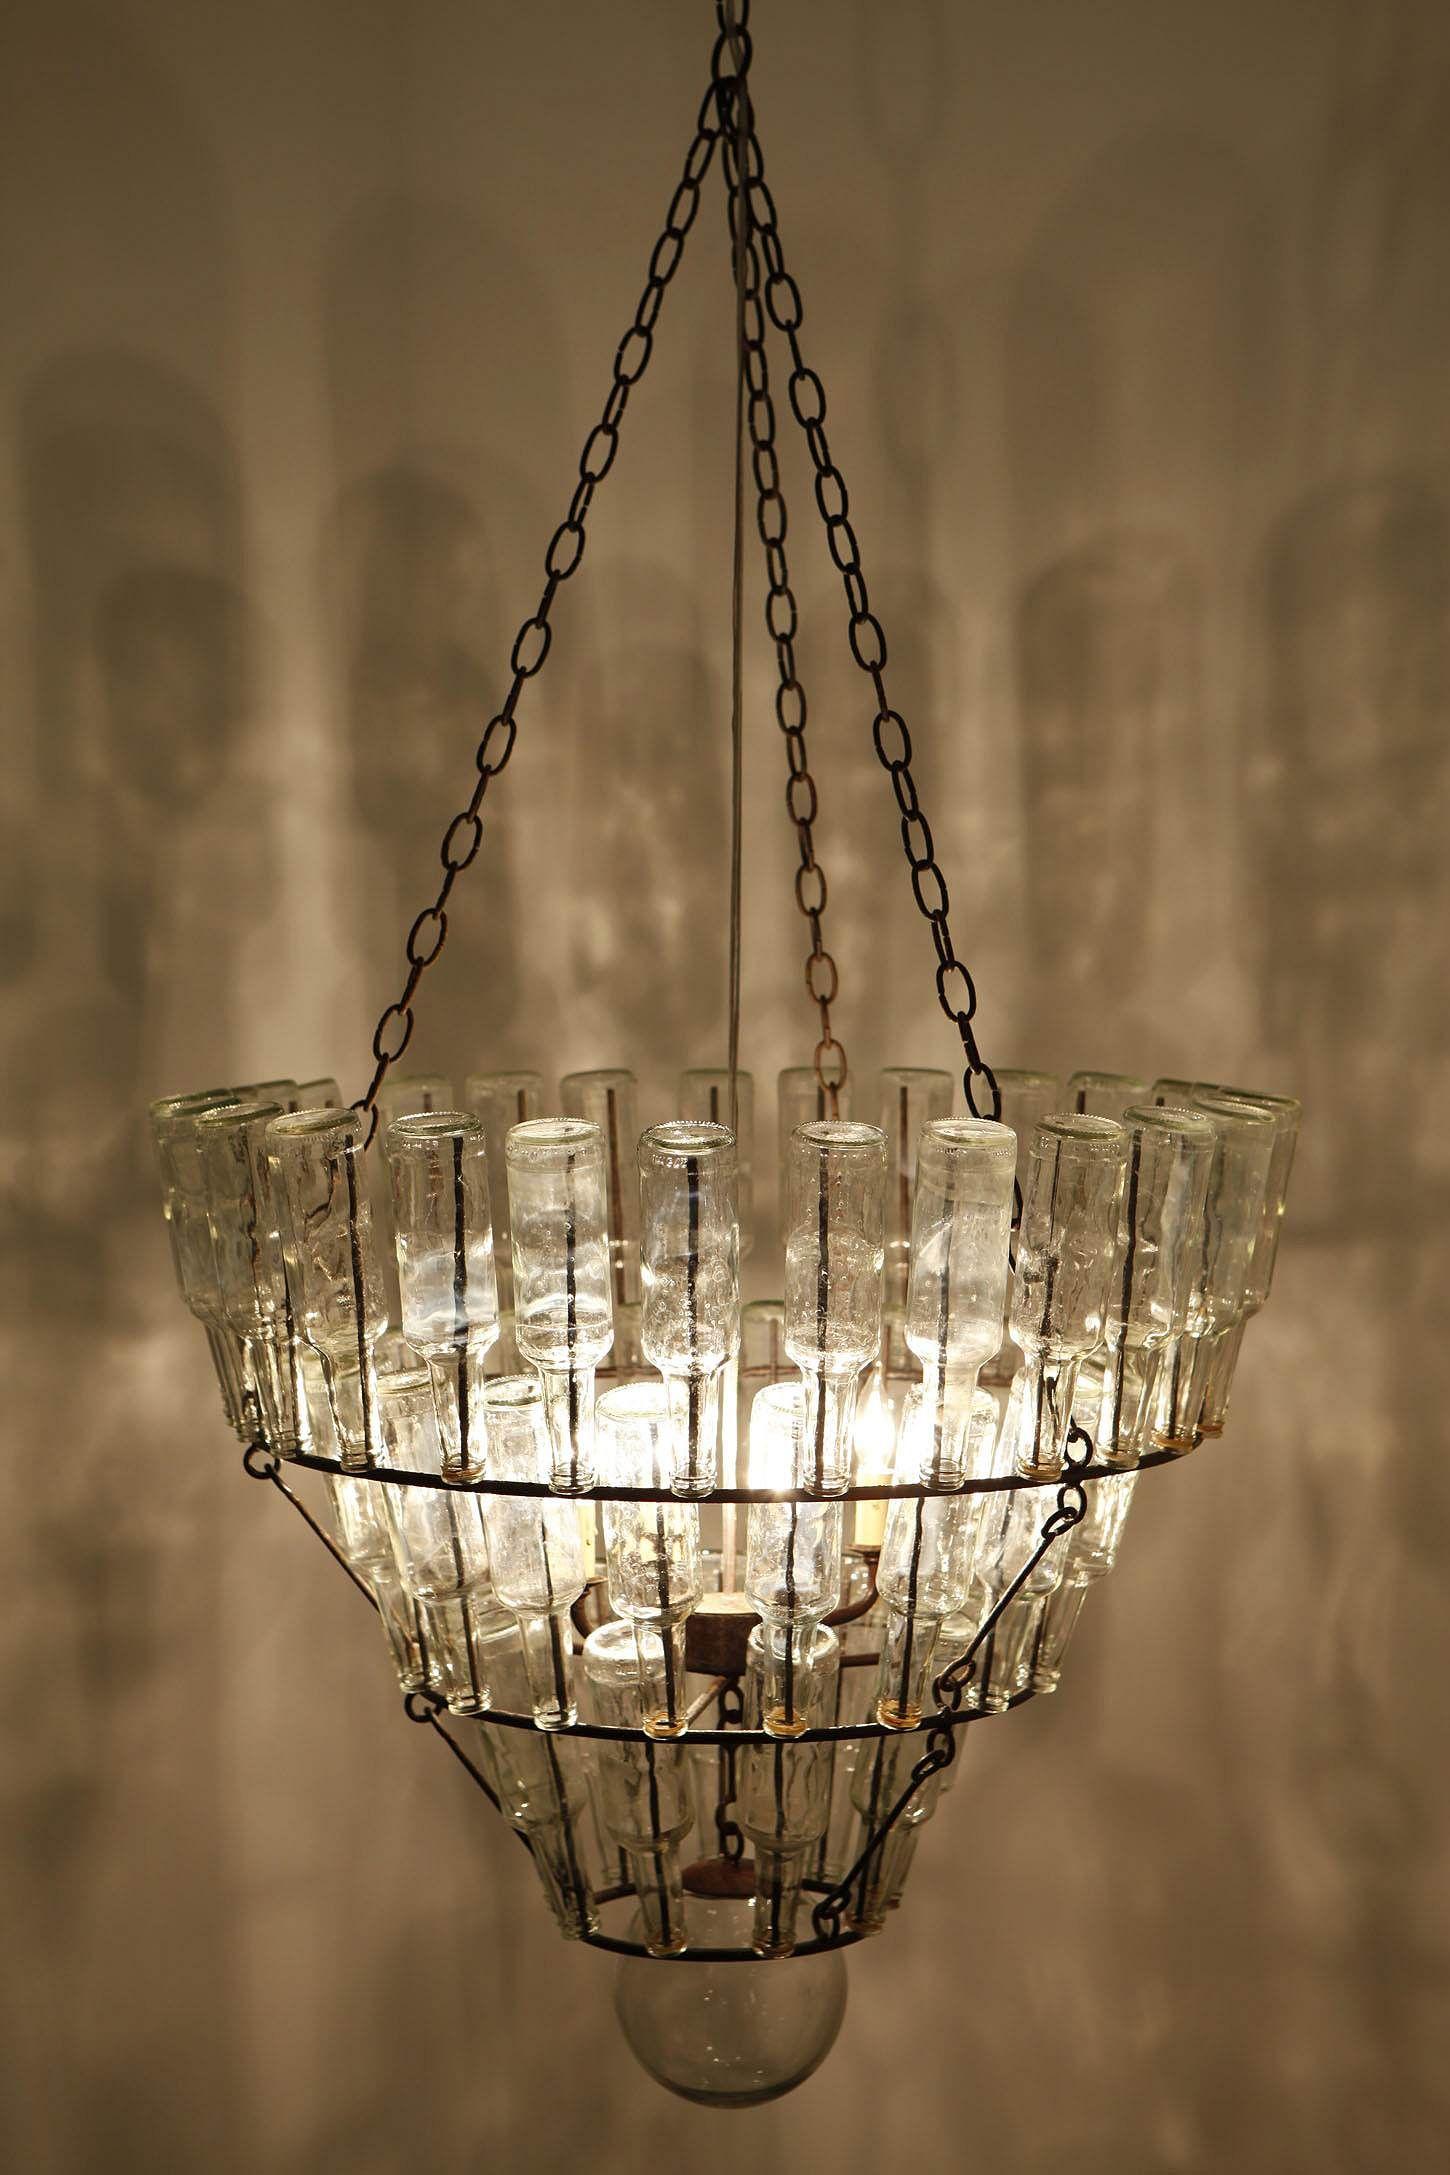 Soda jerk chandelier bottle chandeliers and glass soda jerk chandelier arubaitofo Images